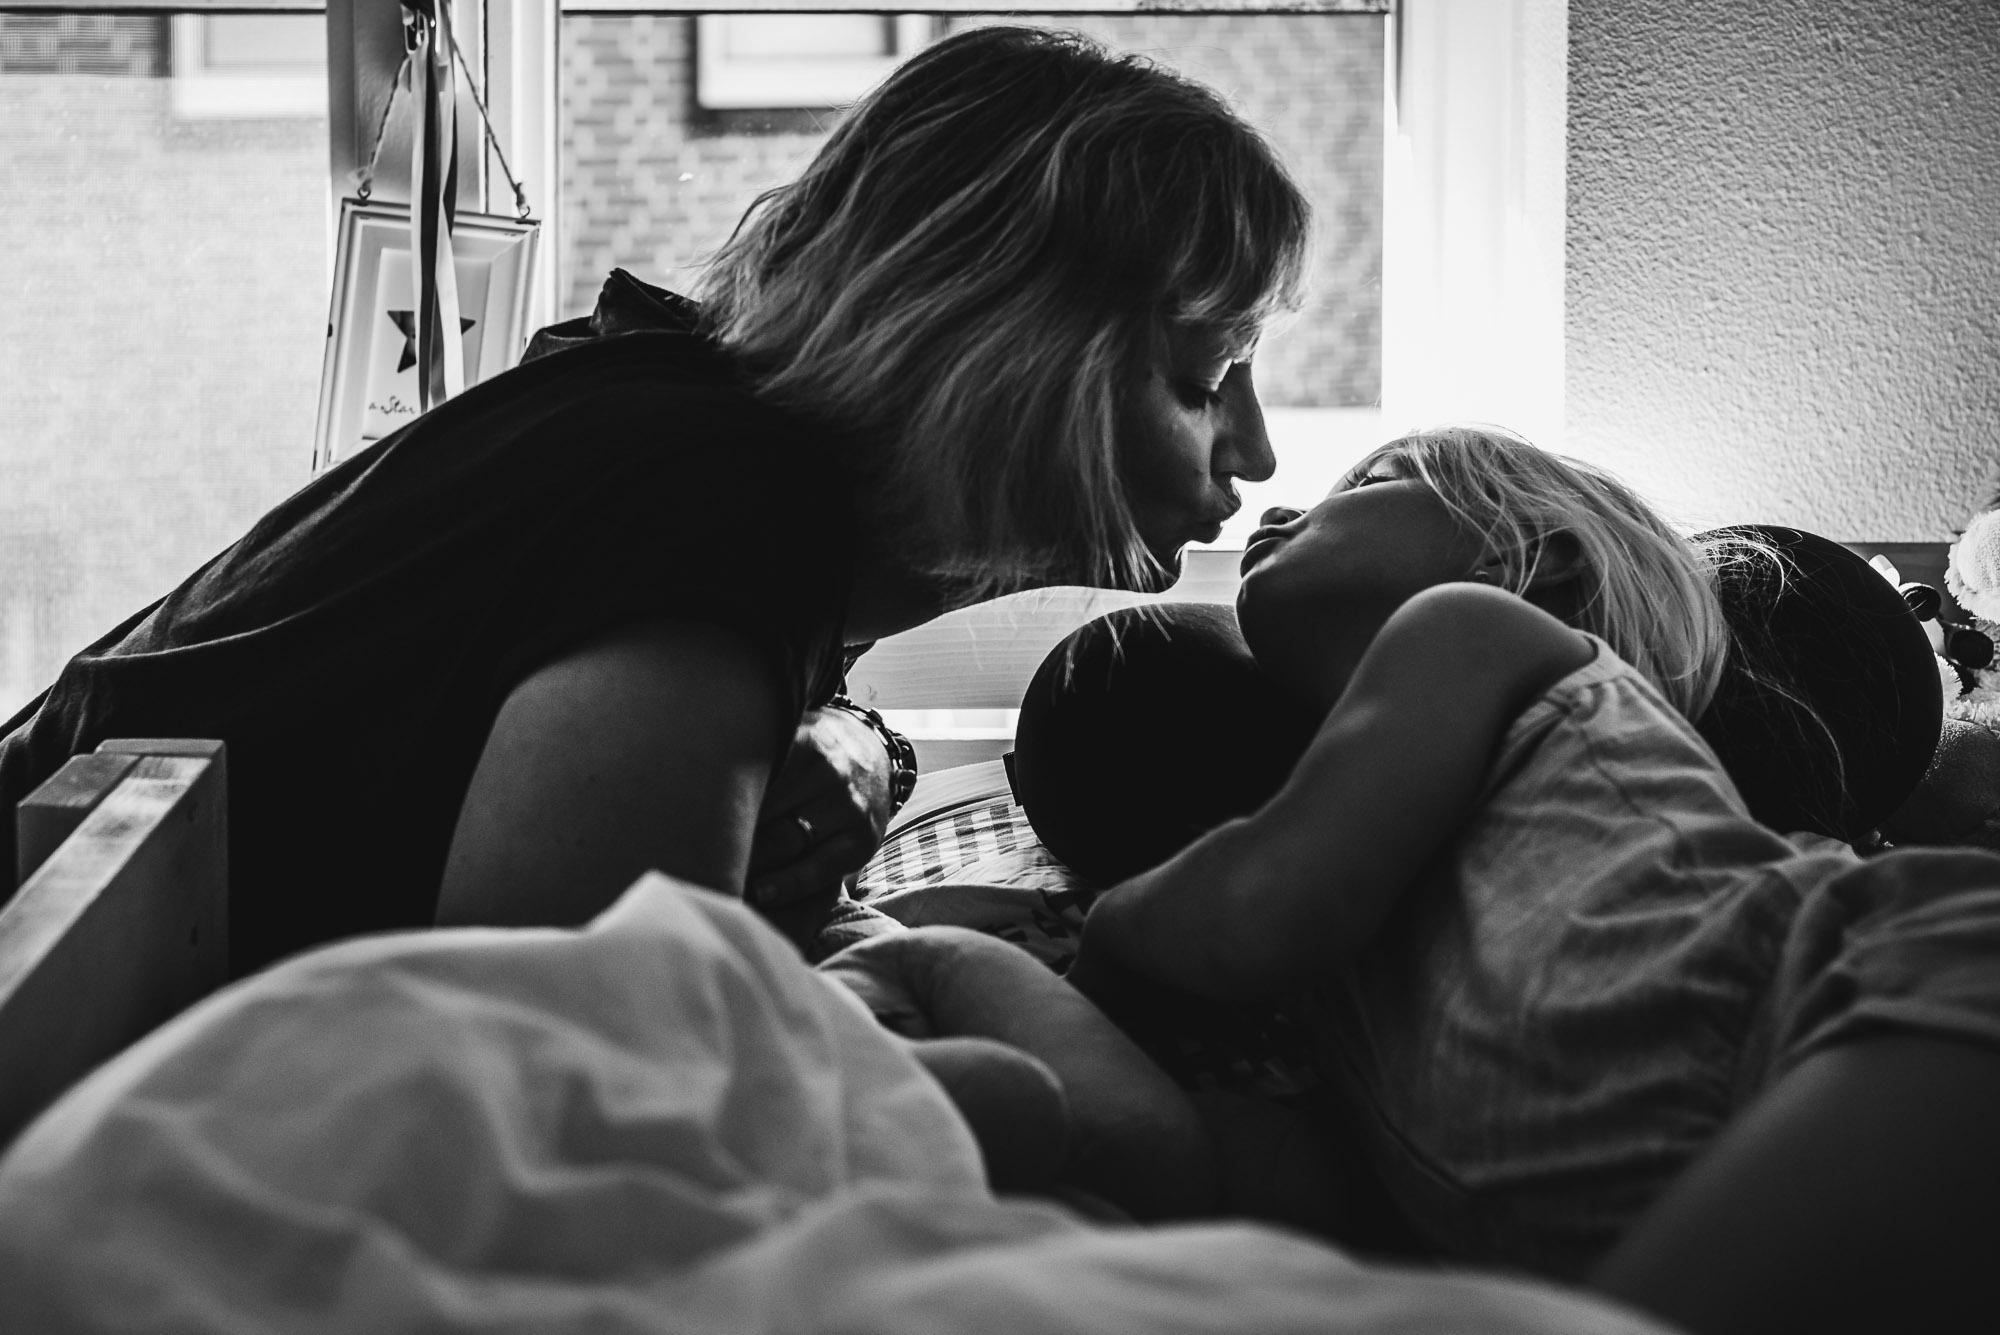 Day in the life Everdingen, documentaire familie fotografie, documentair familie fotograaf Sandra Stokmans Fotografie